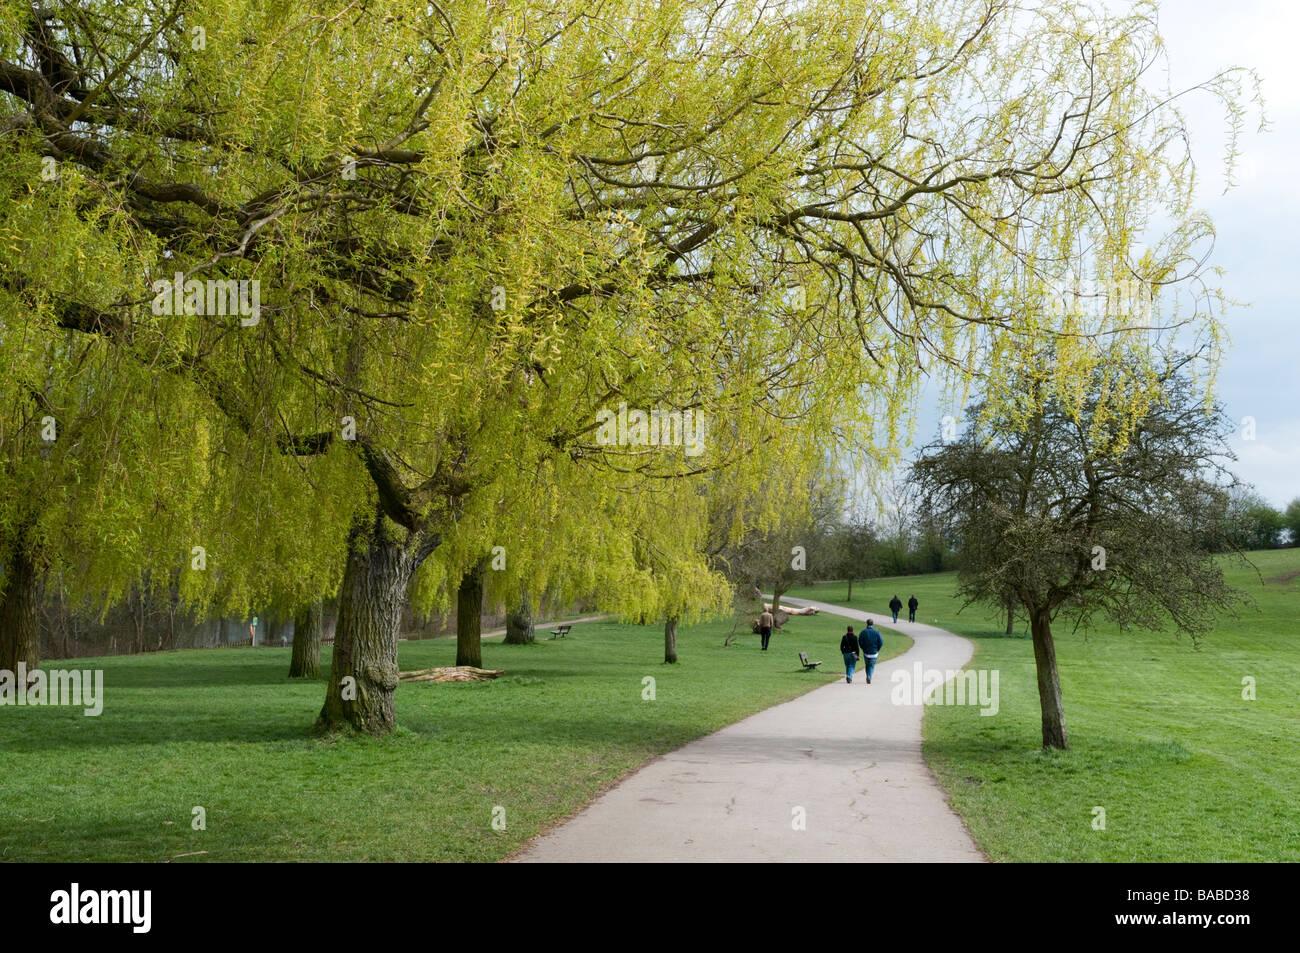 People walking on Hampstead Heath, London, England, UK - Stock Image